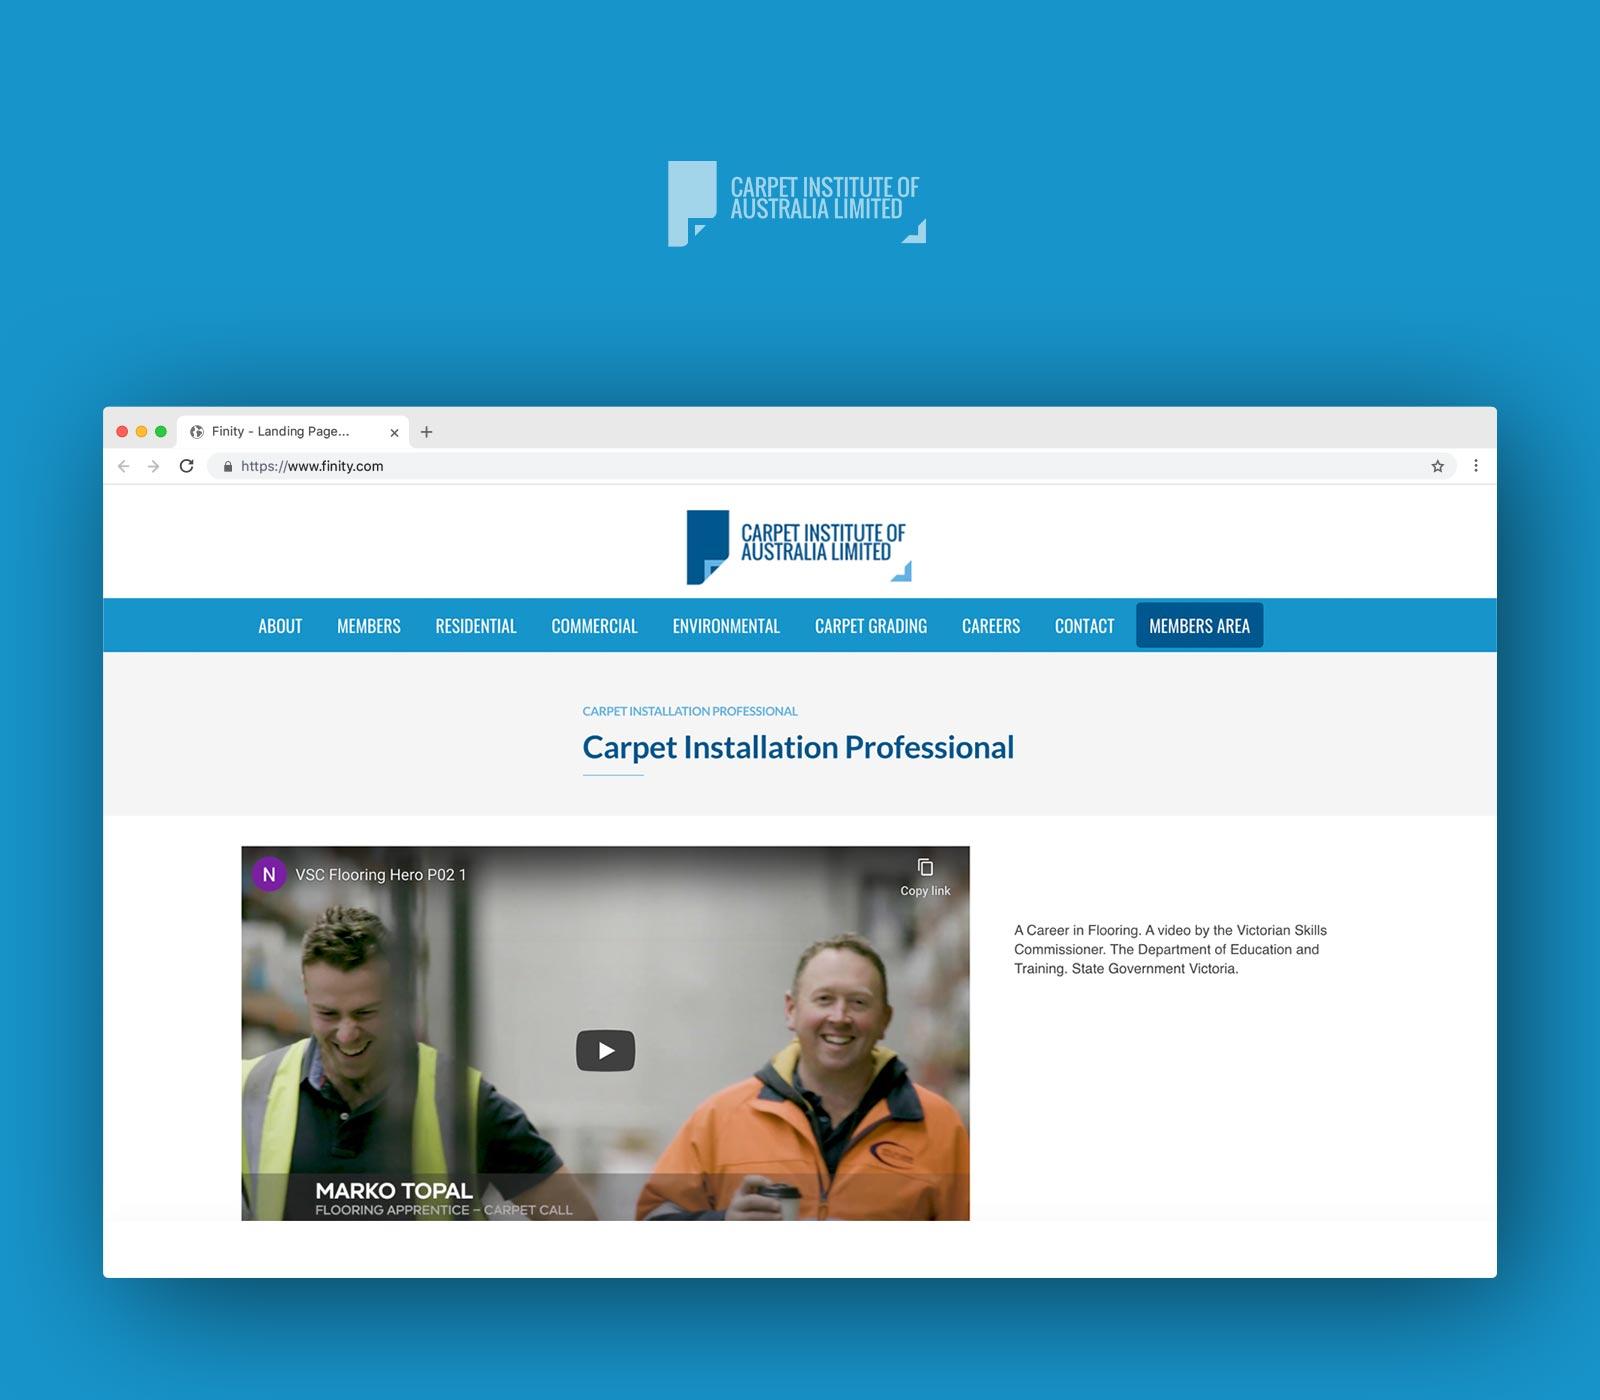 Carpet Institute of Australia Limited: Industry Associations